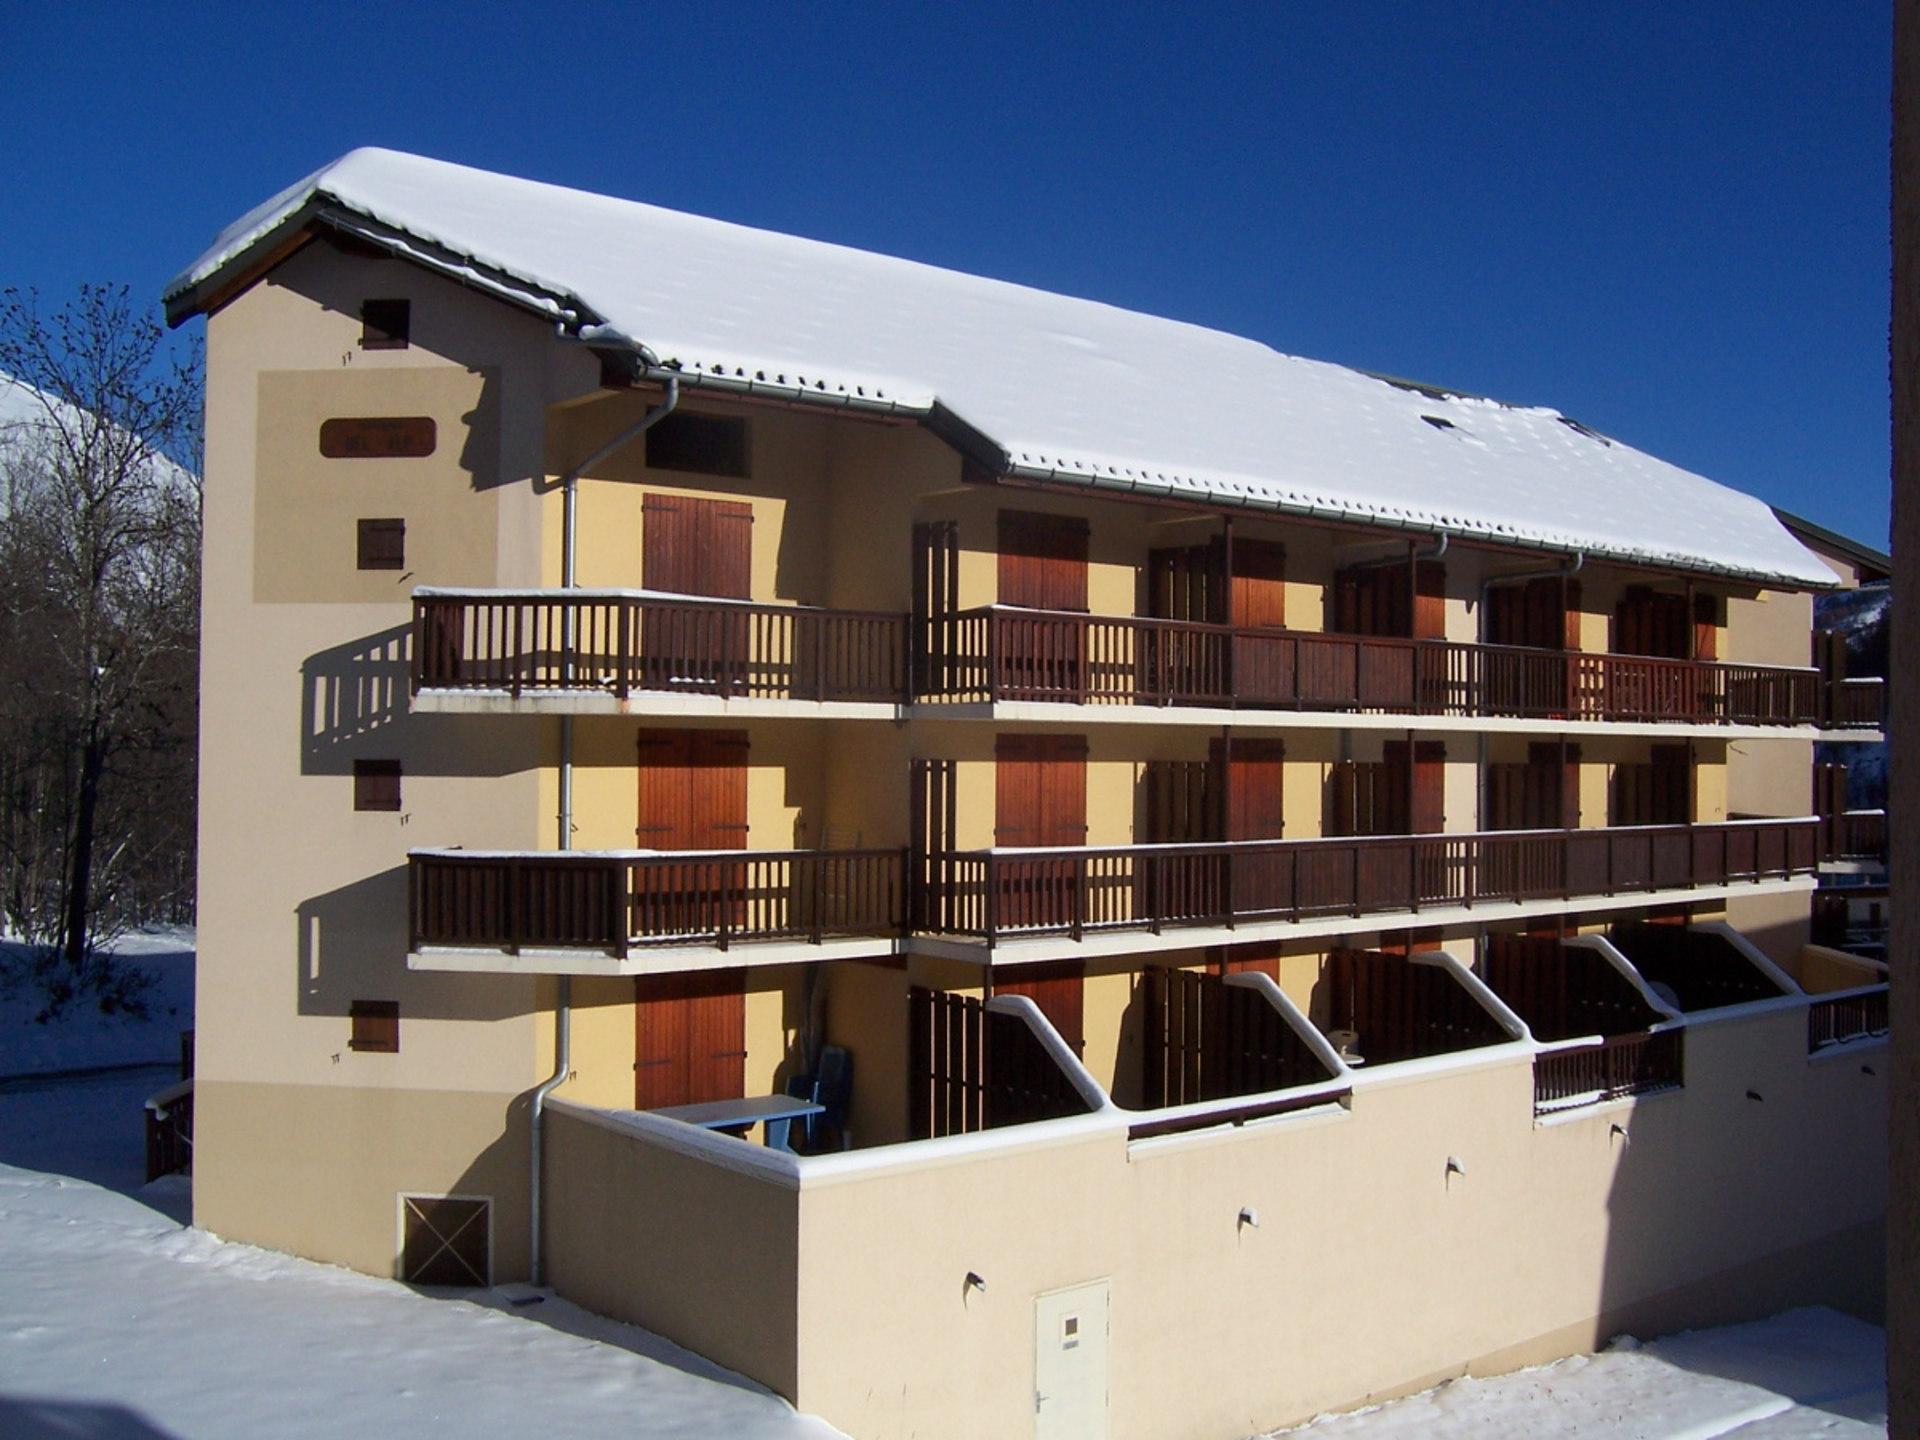 Appartements Bel Alp